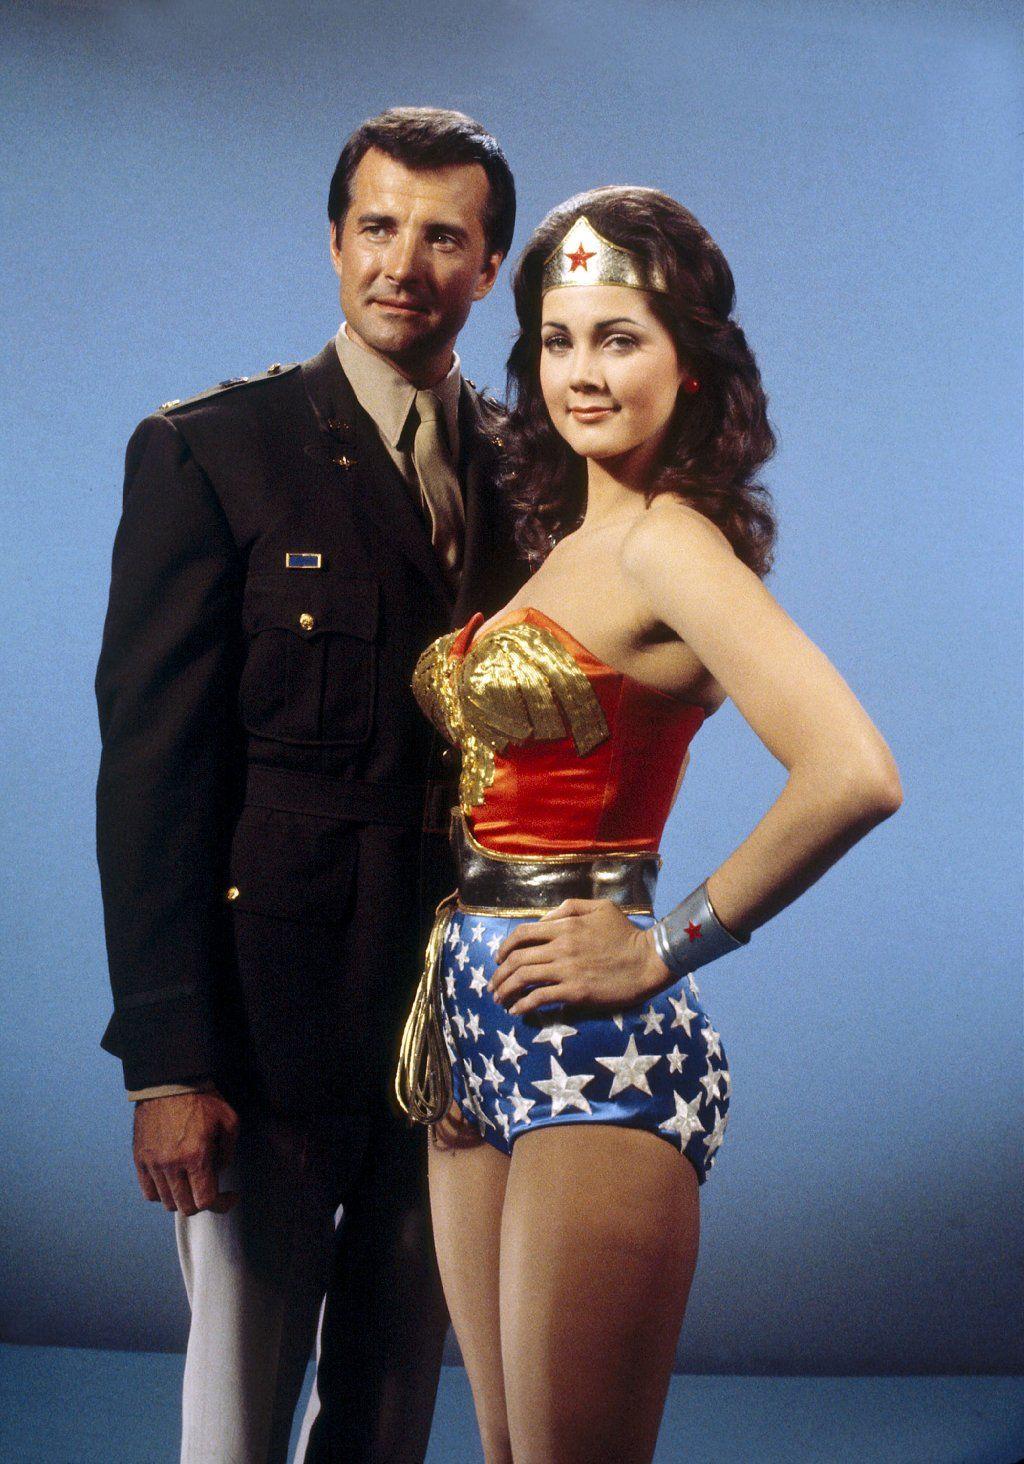 Lynda Carter and Lyle Waggoner as Wonder Woman and Steve Trevor | TV